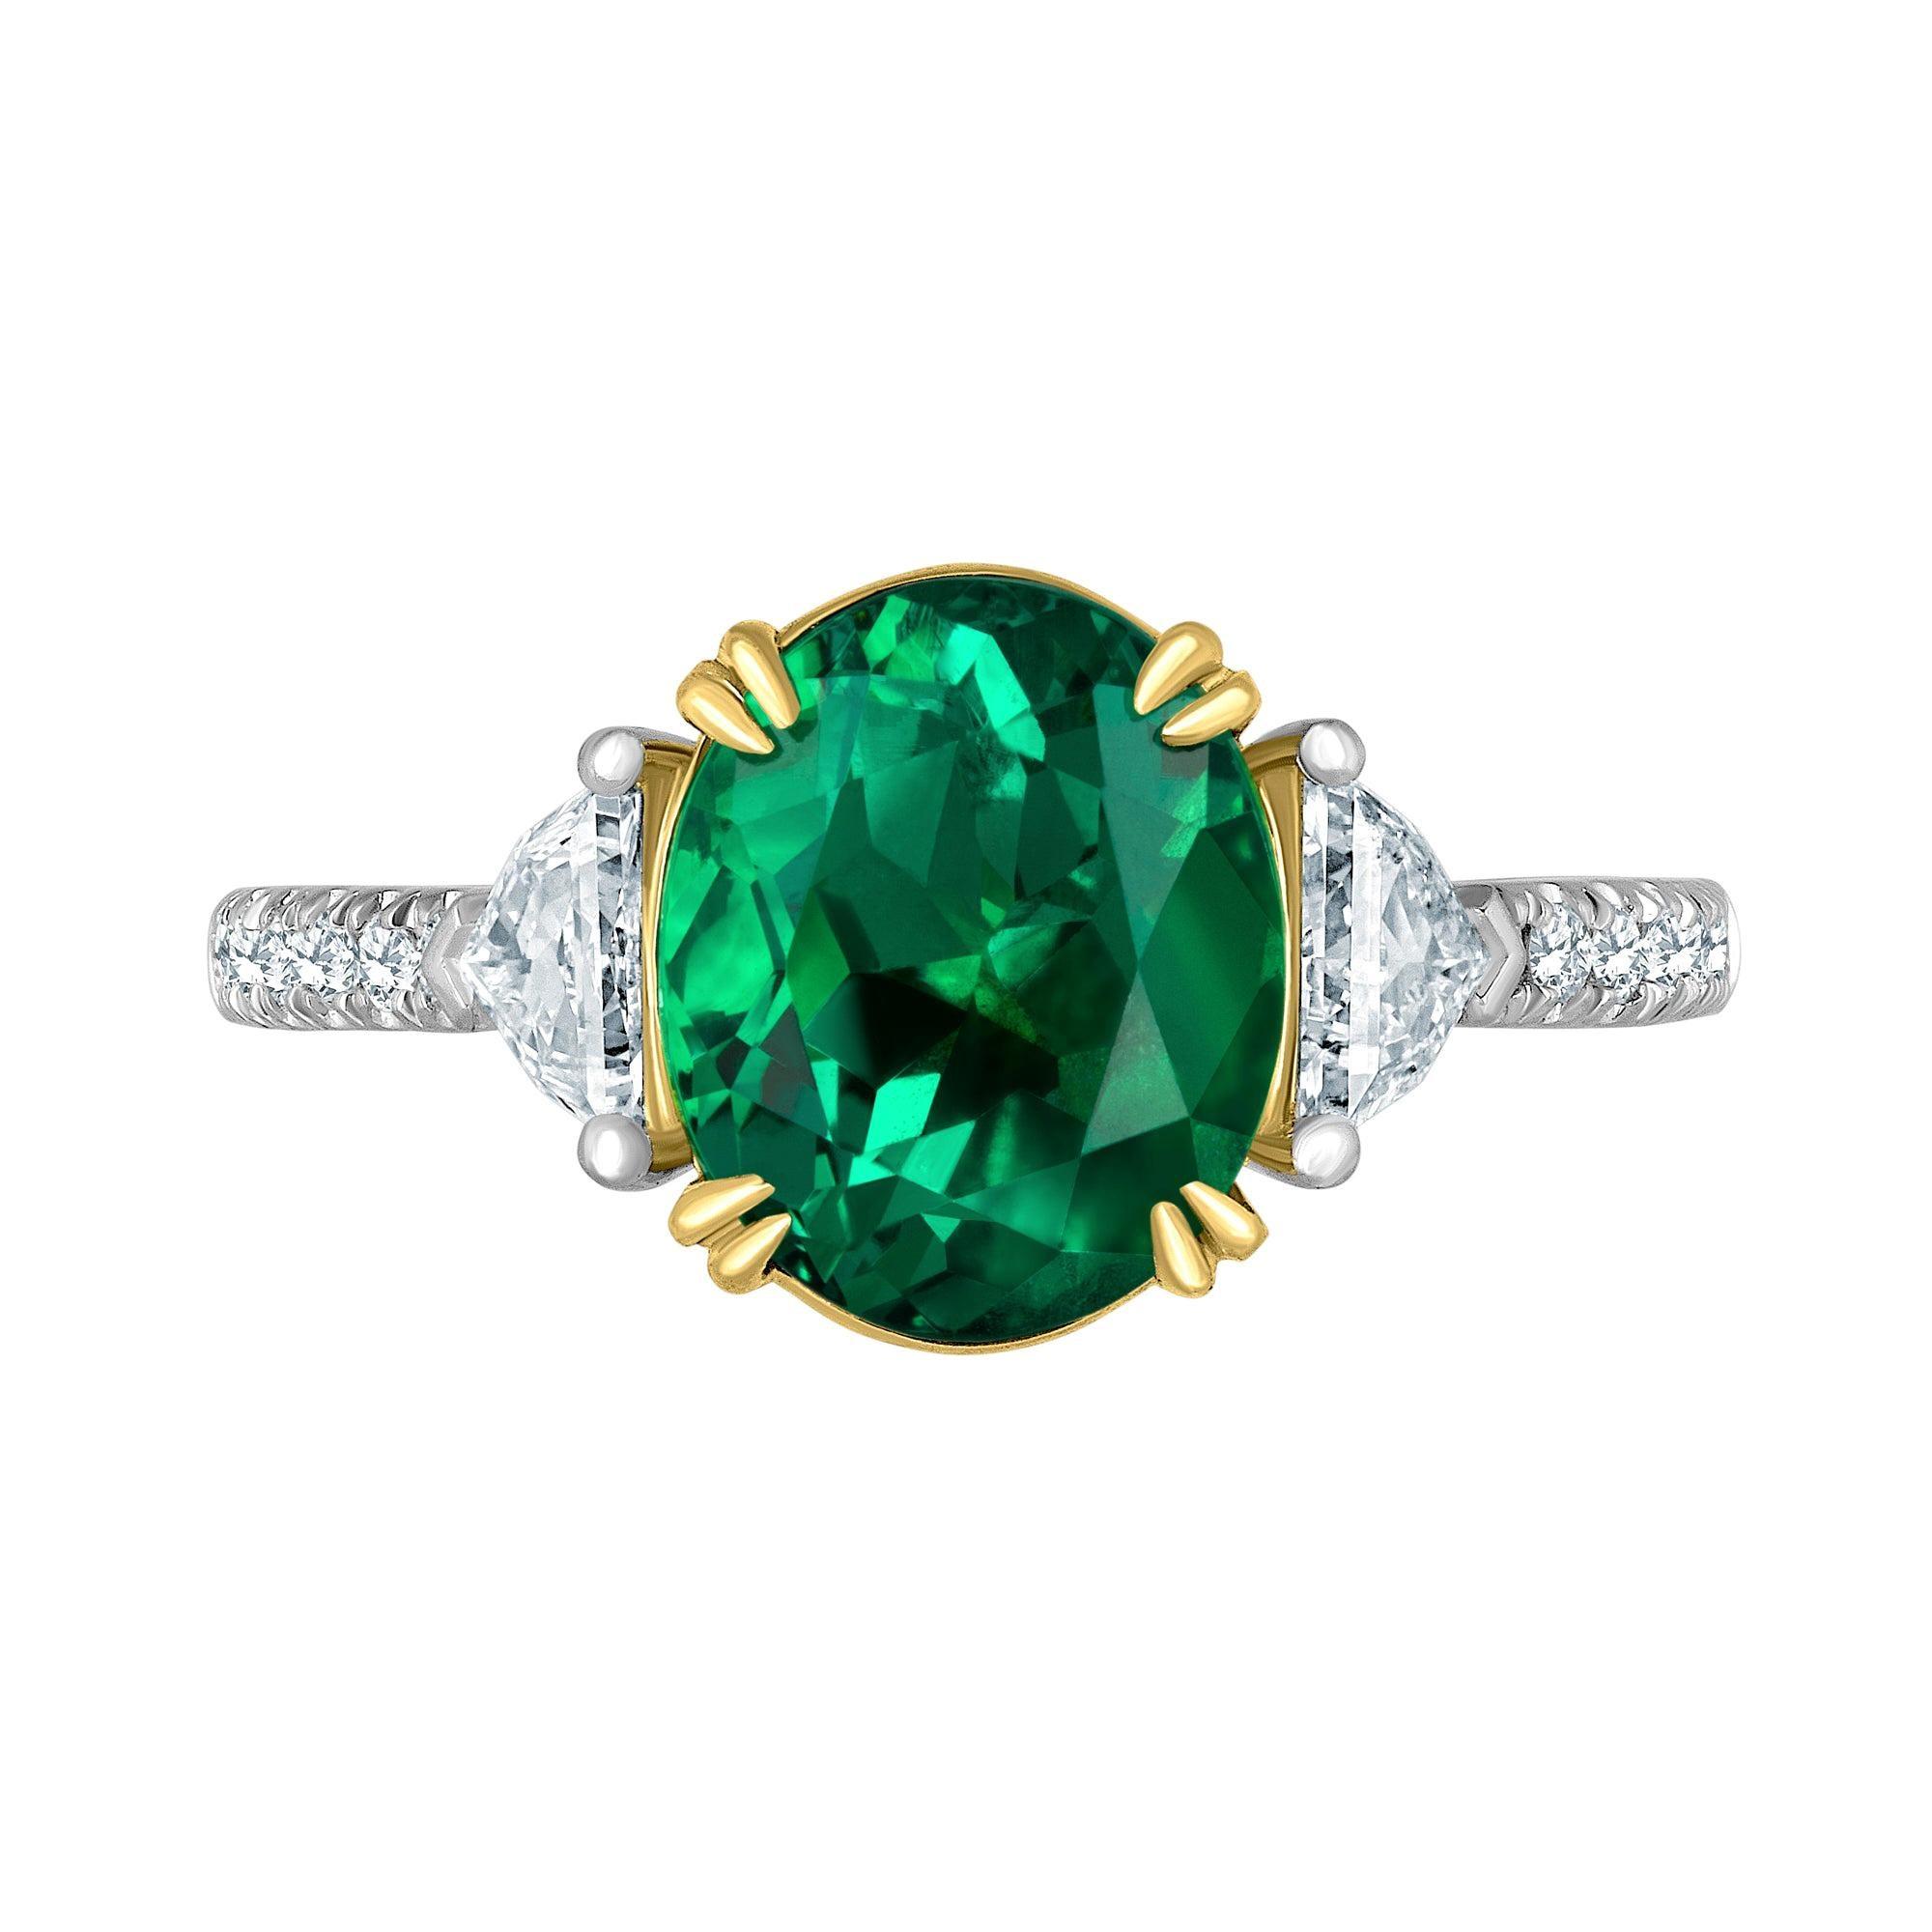 Emilio Jewelry Certified 3.82 Carat Colombian Emerald Diamond Ring